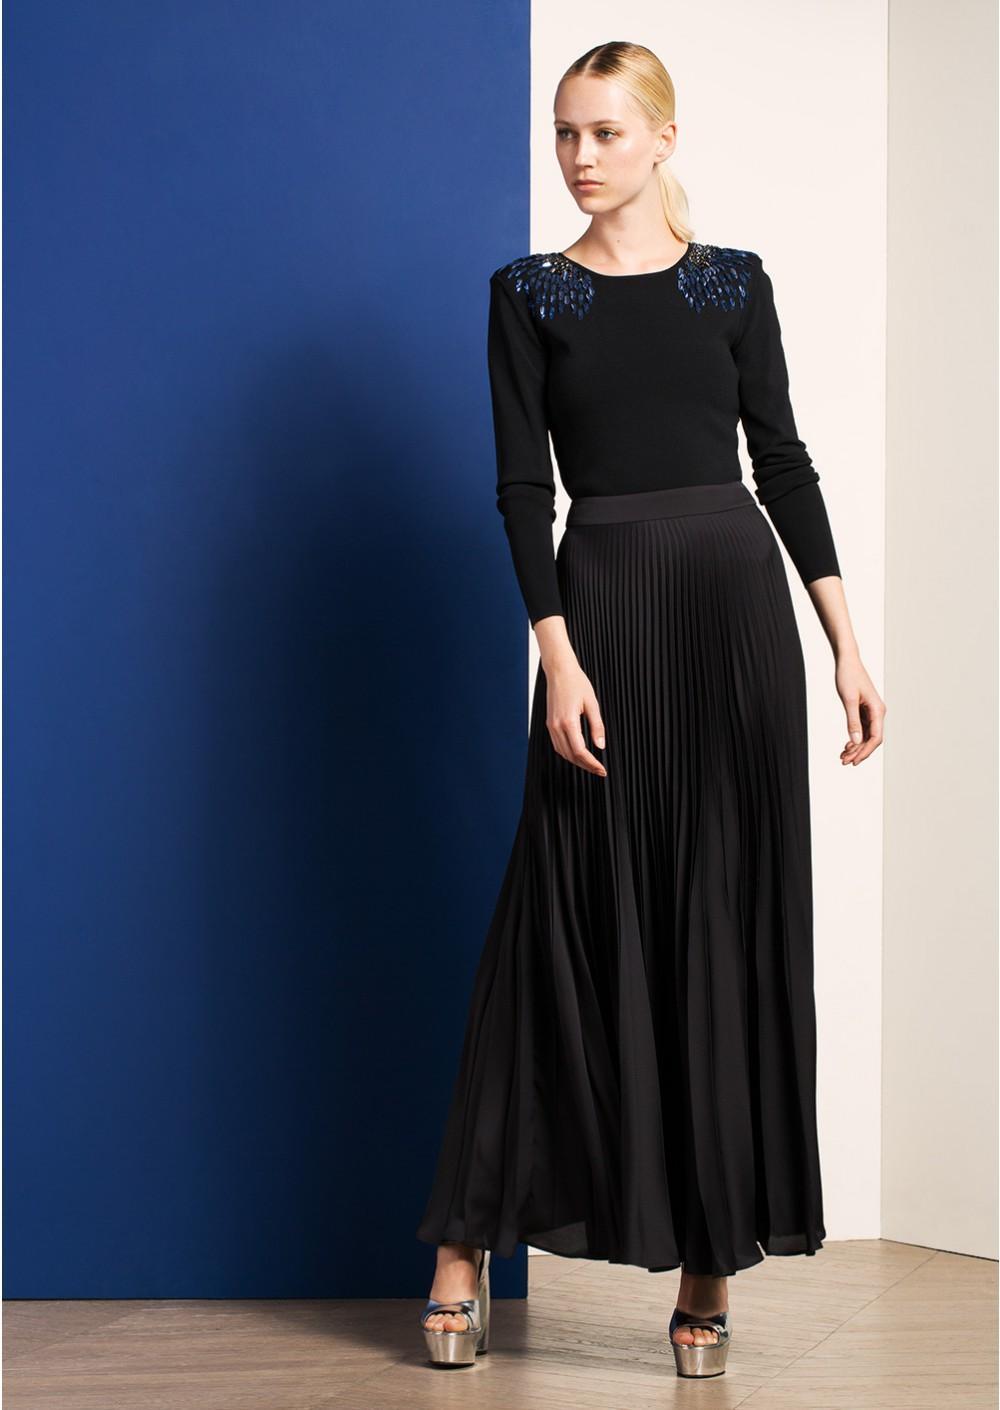 la jupe pliss e prend une longueur d 39 avance madame figaro. Black Bedroom Furniture Sets. Home Design Ideas